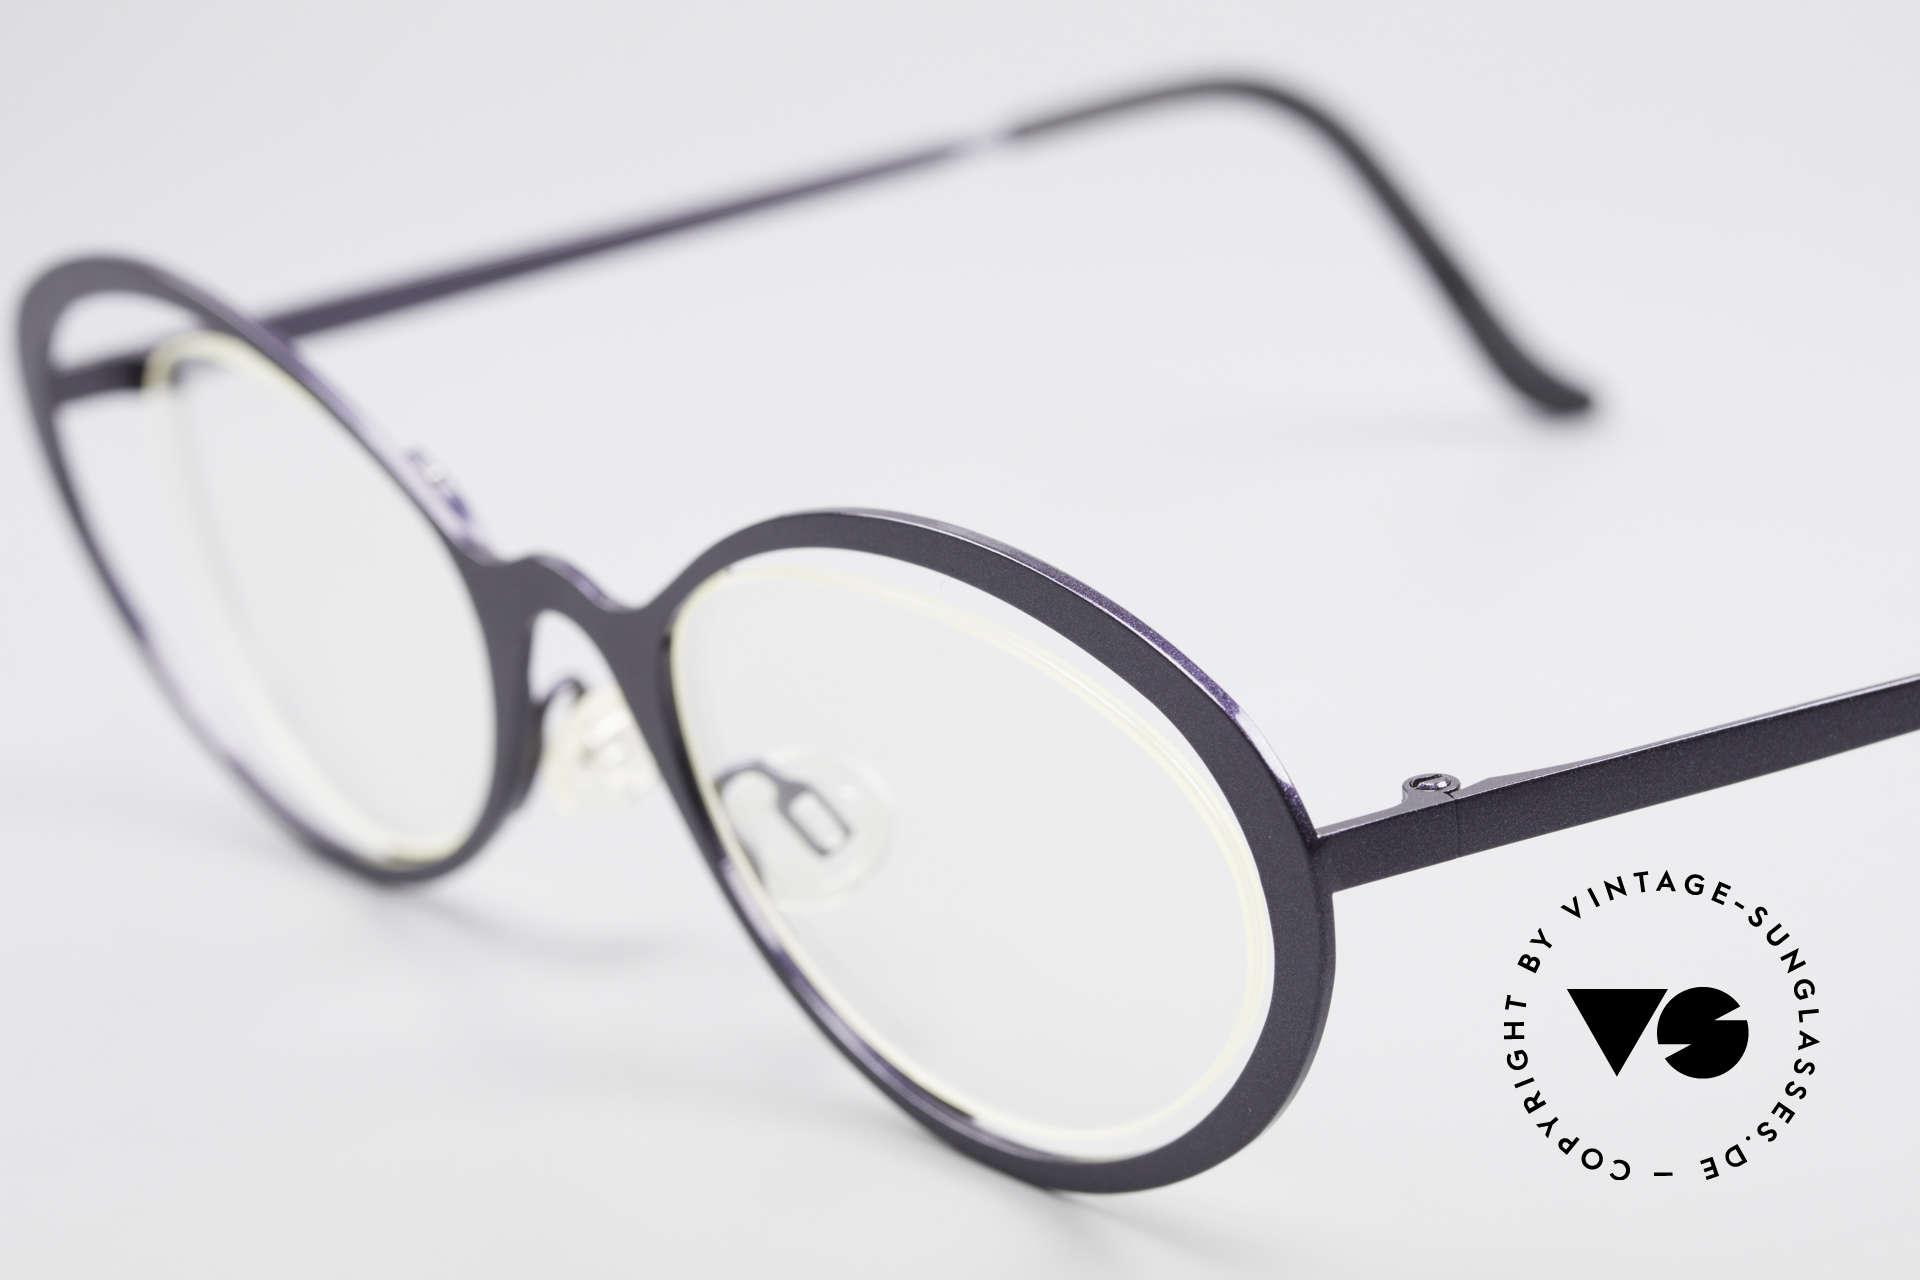 Theo Belgium LuLu Rimless Cateye Glasses 90's, an extraordinary designer piece by THEO BELGIUM, Made for Women